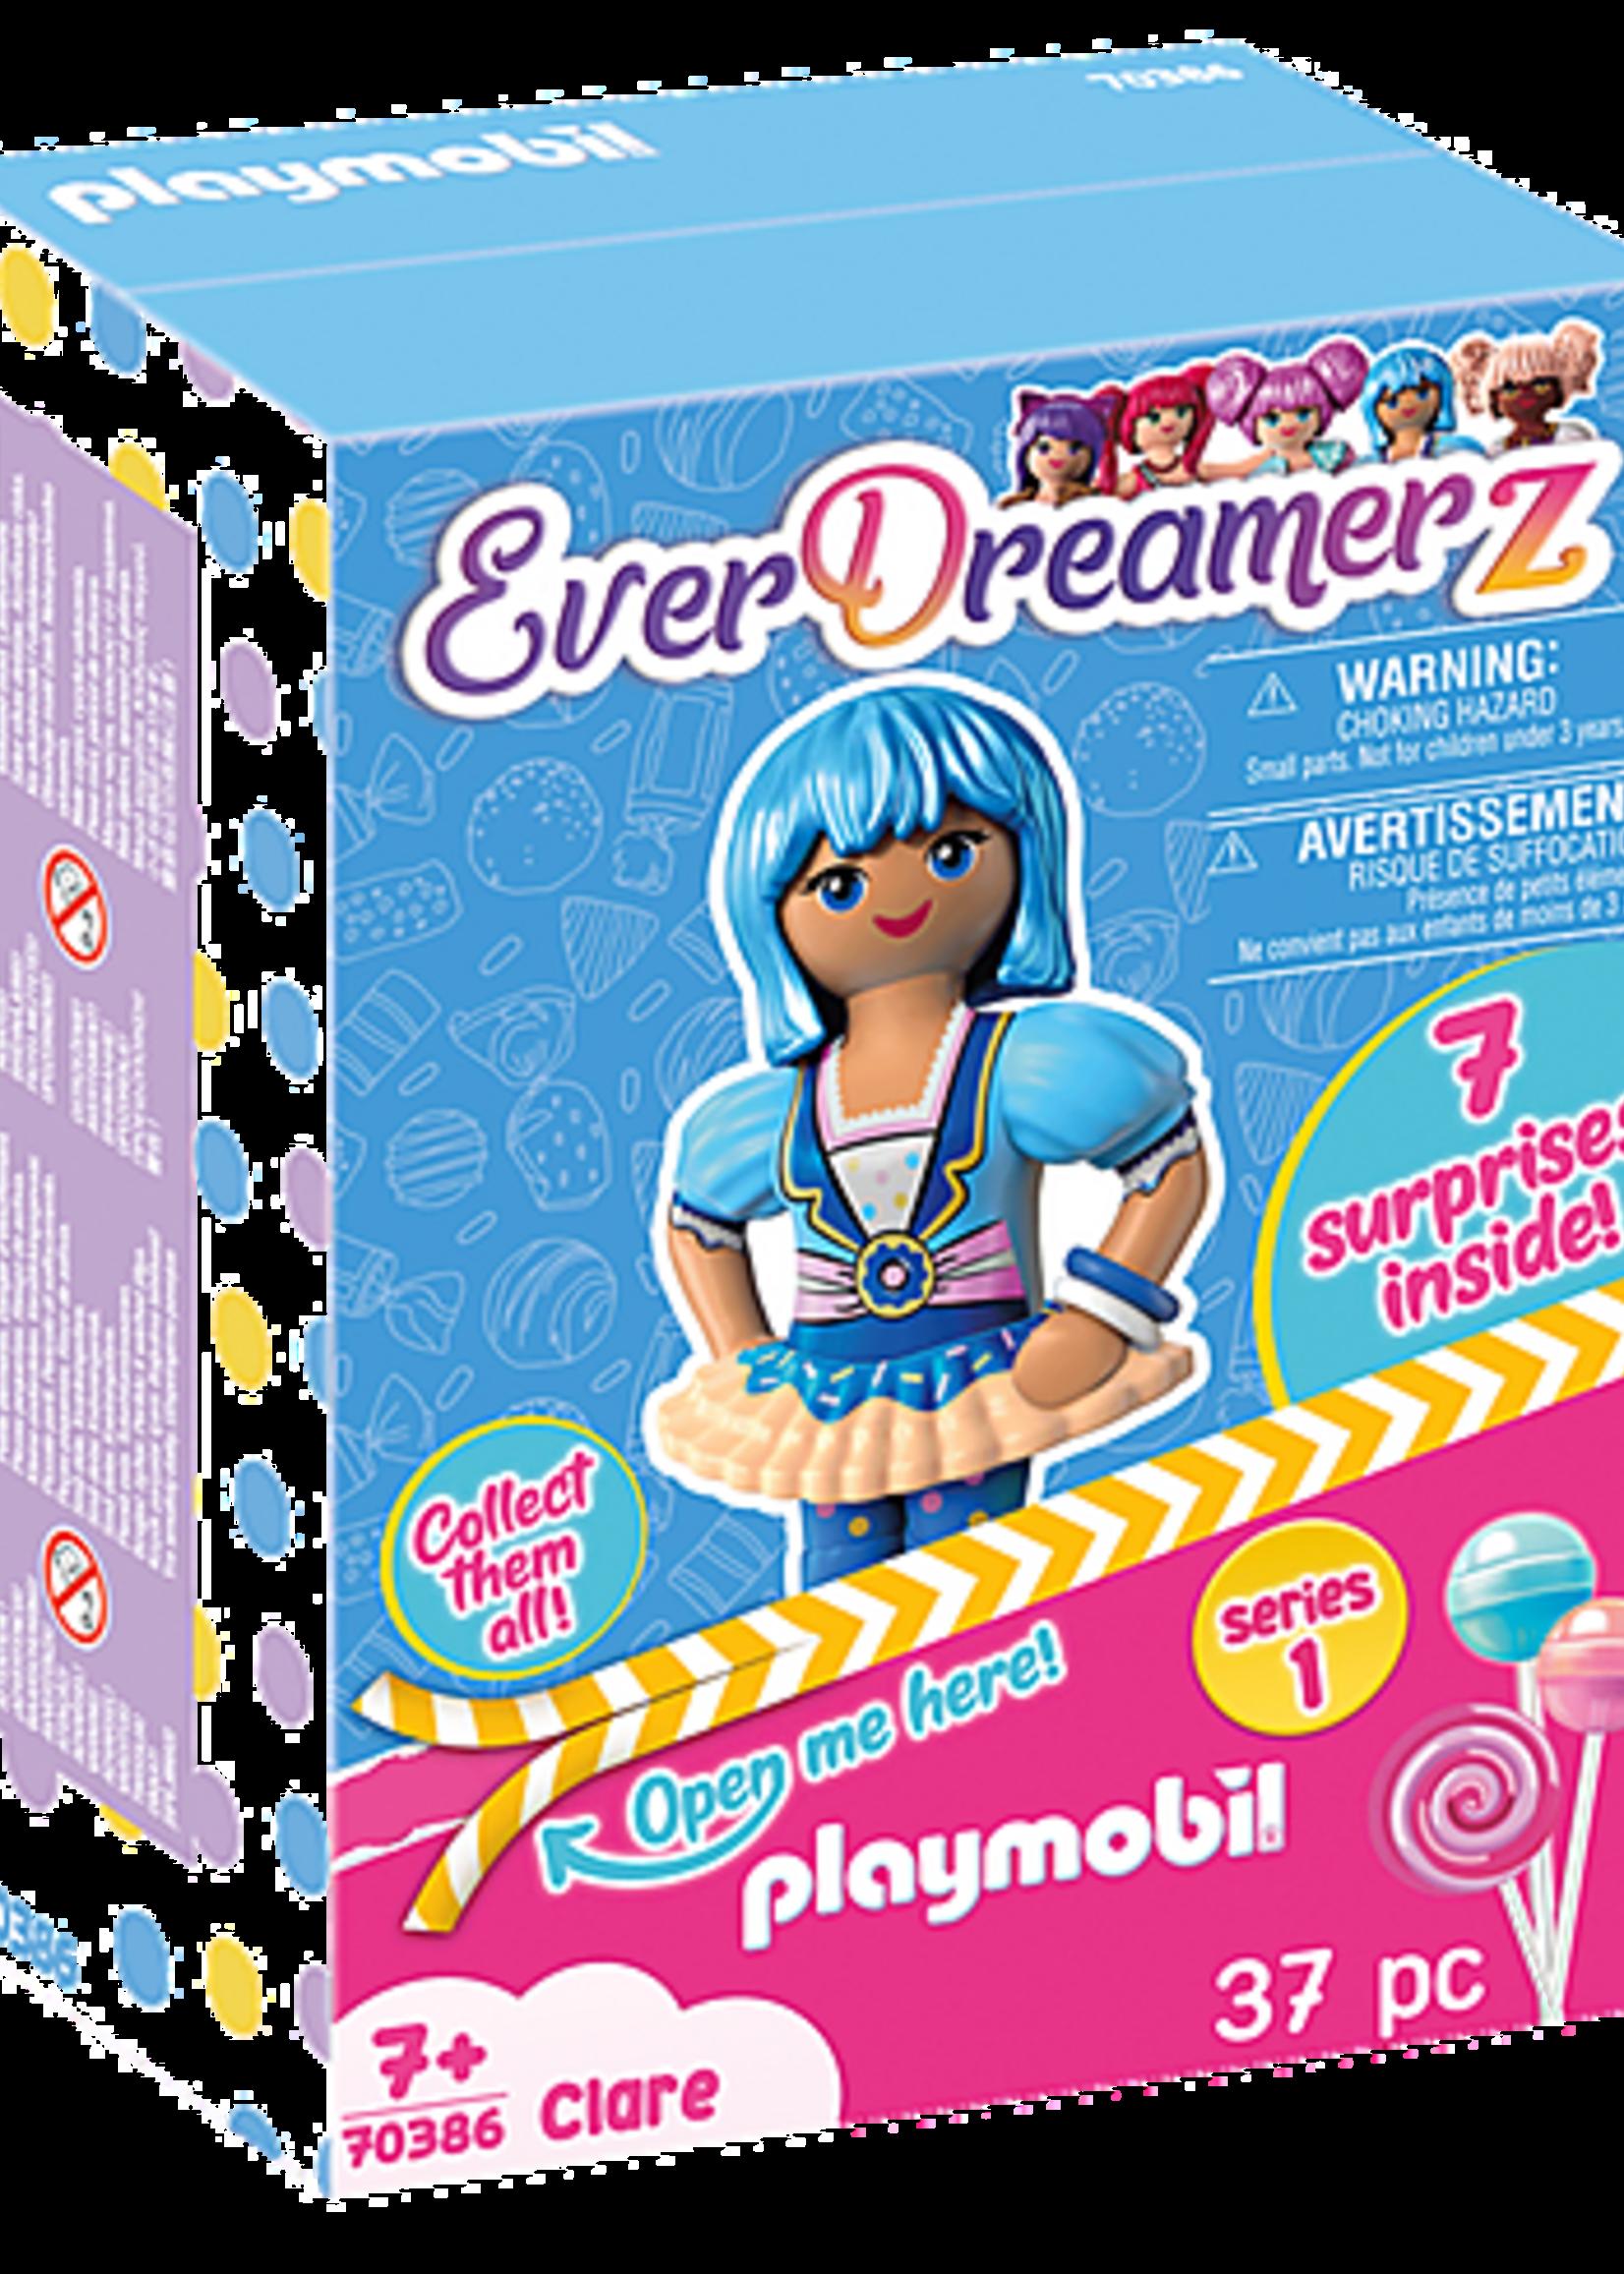 Playmobil Everdreamerz Clare